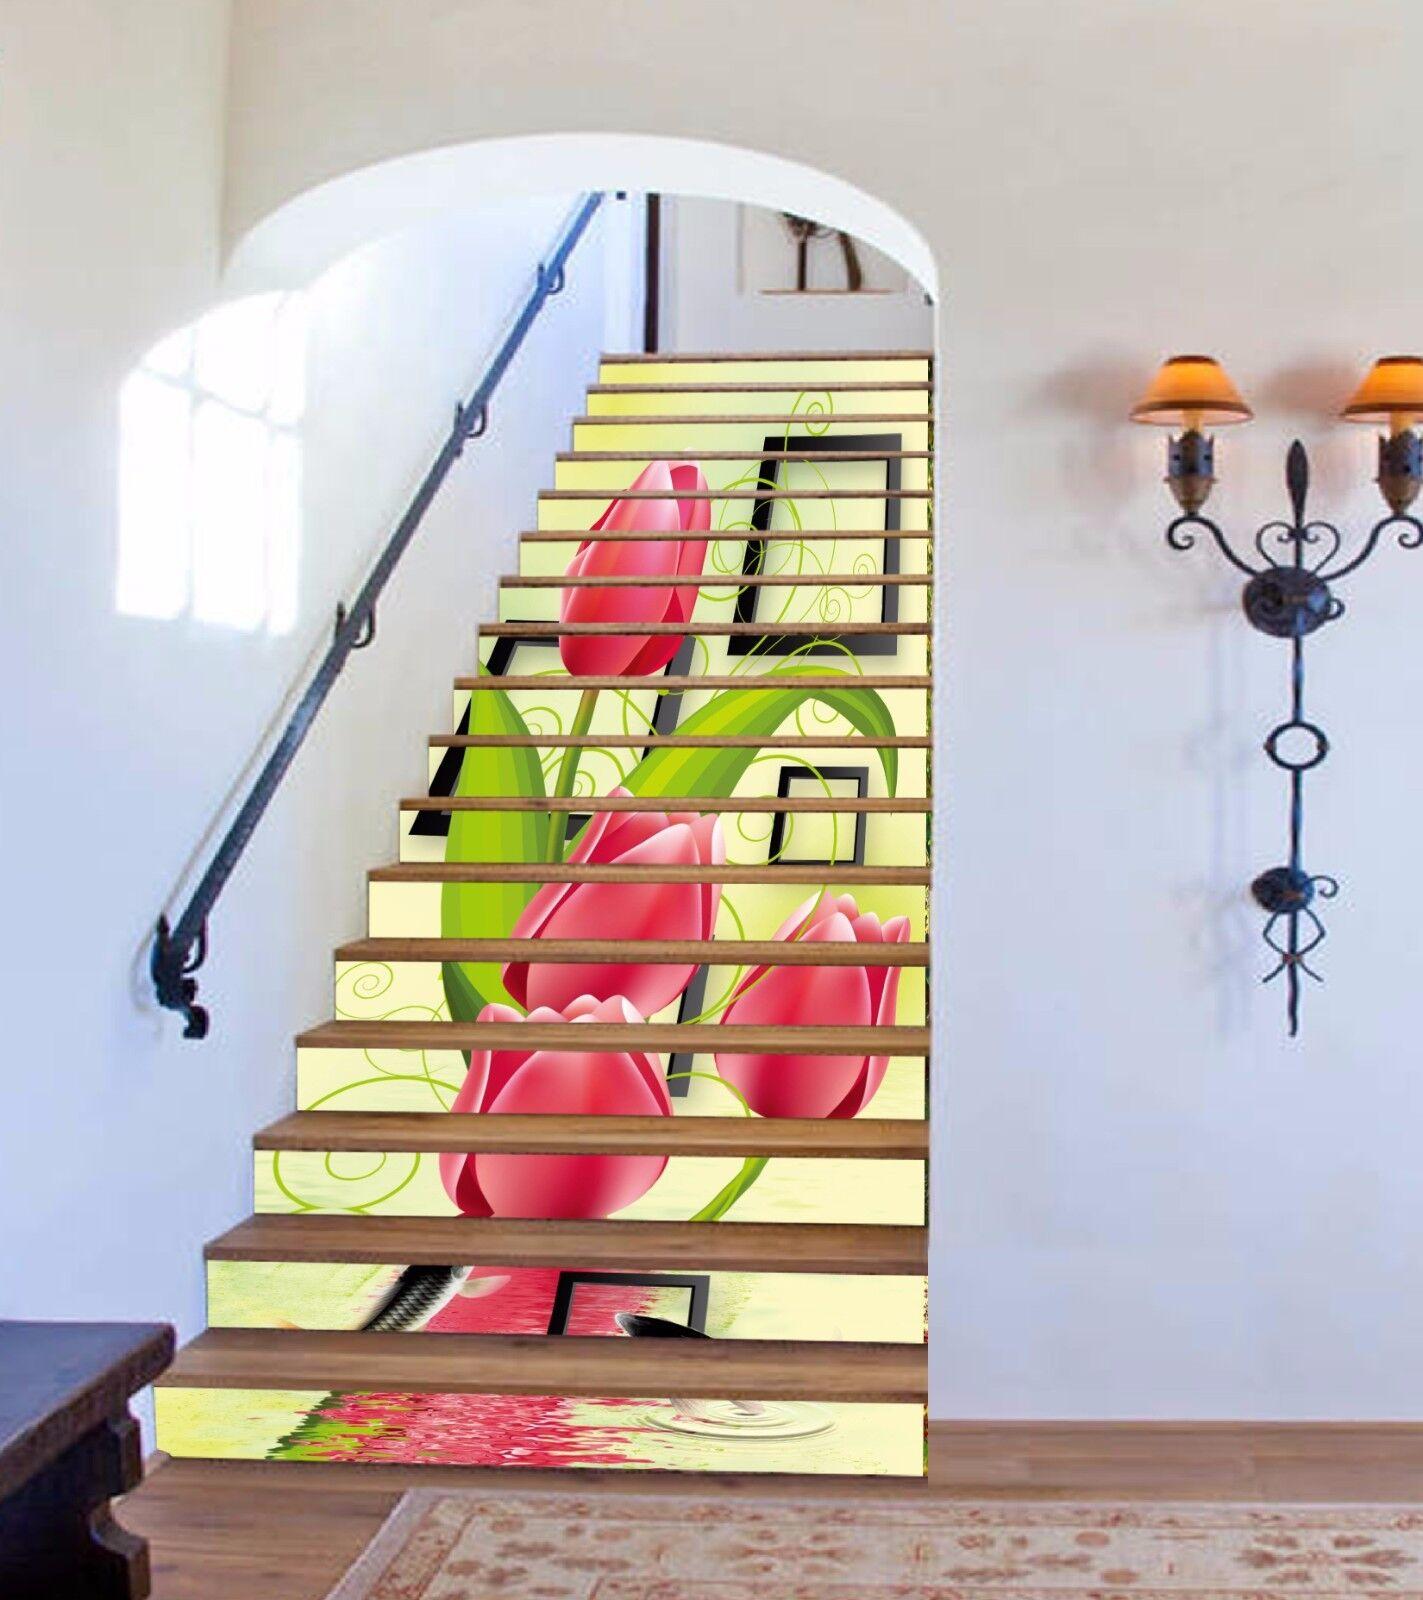 3D Flowers Frames 3 Stair Risers Decoration Photo Mural Vinyl Decal Wallpaper UK